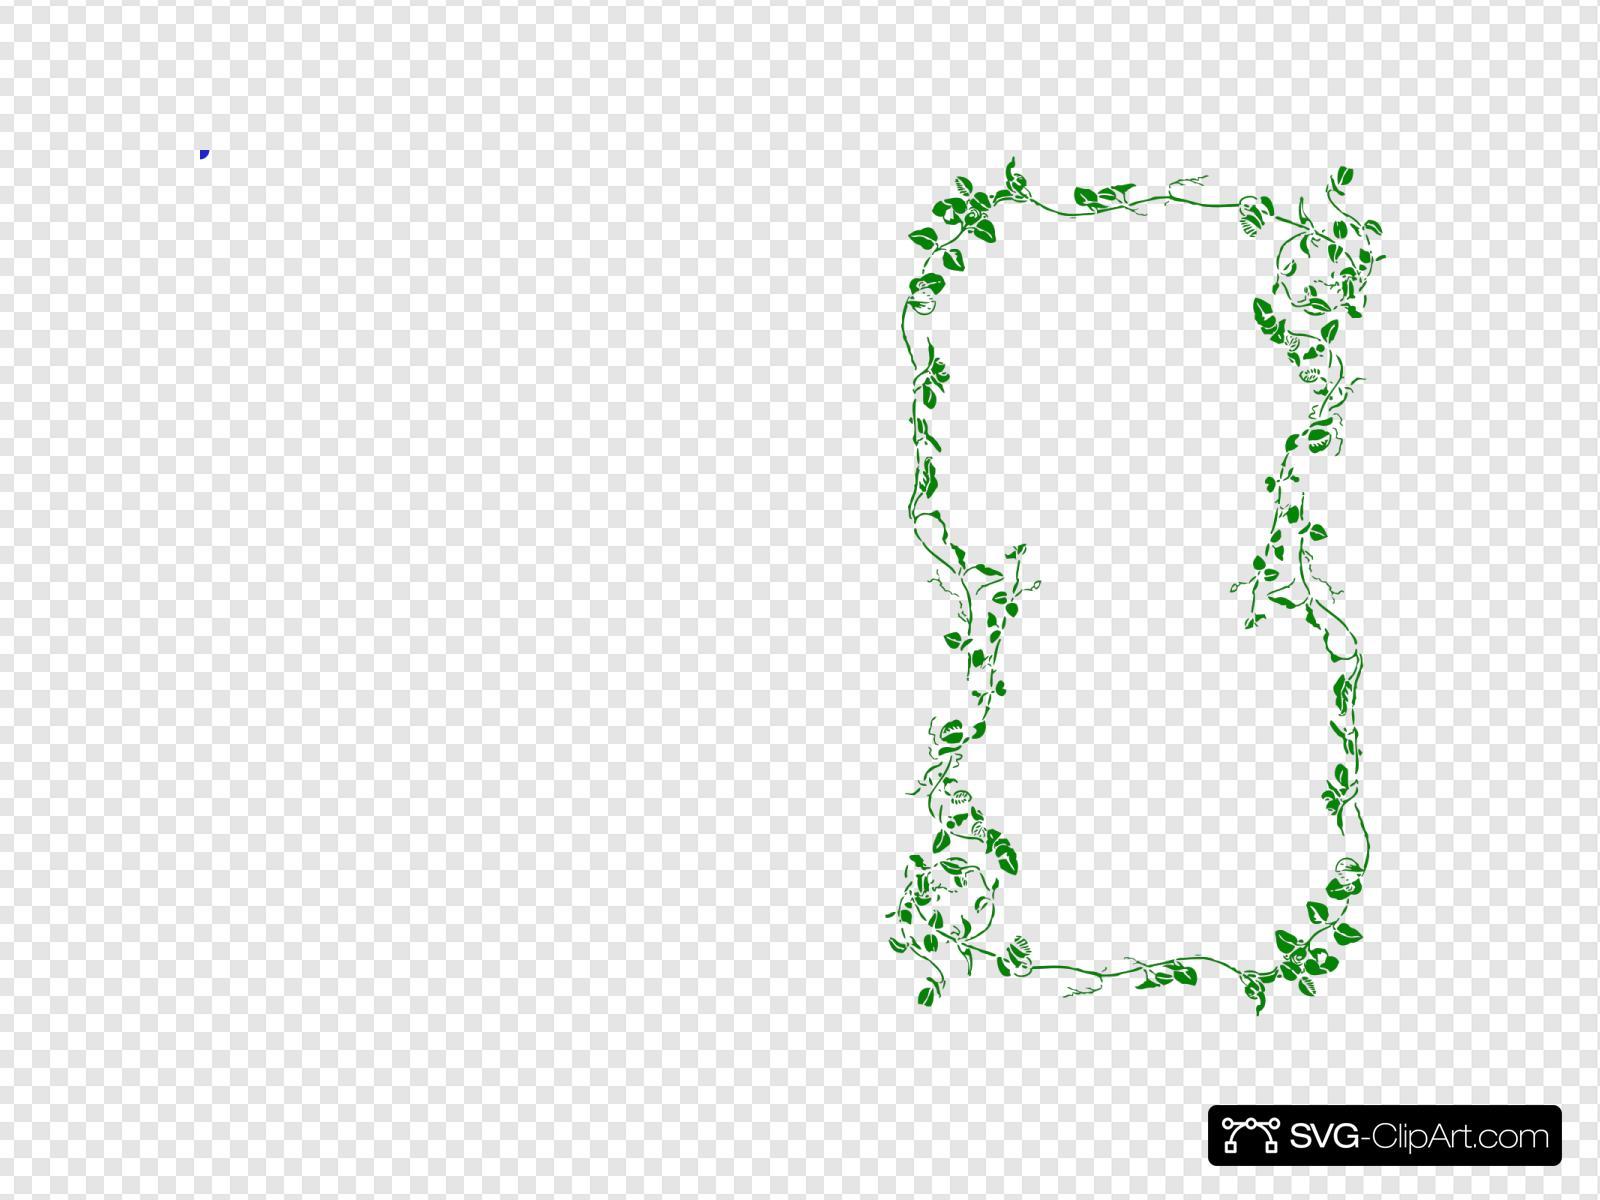 Ivy Border Clip Art - Royalty Free - GoGraph